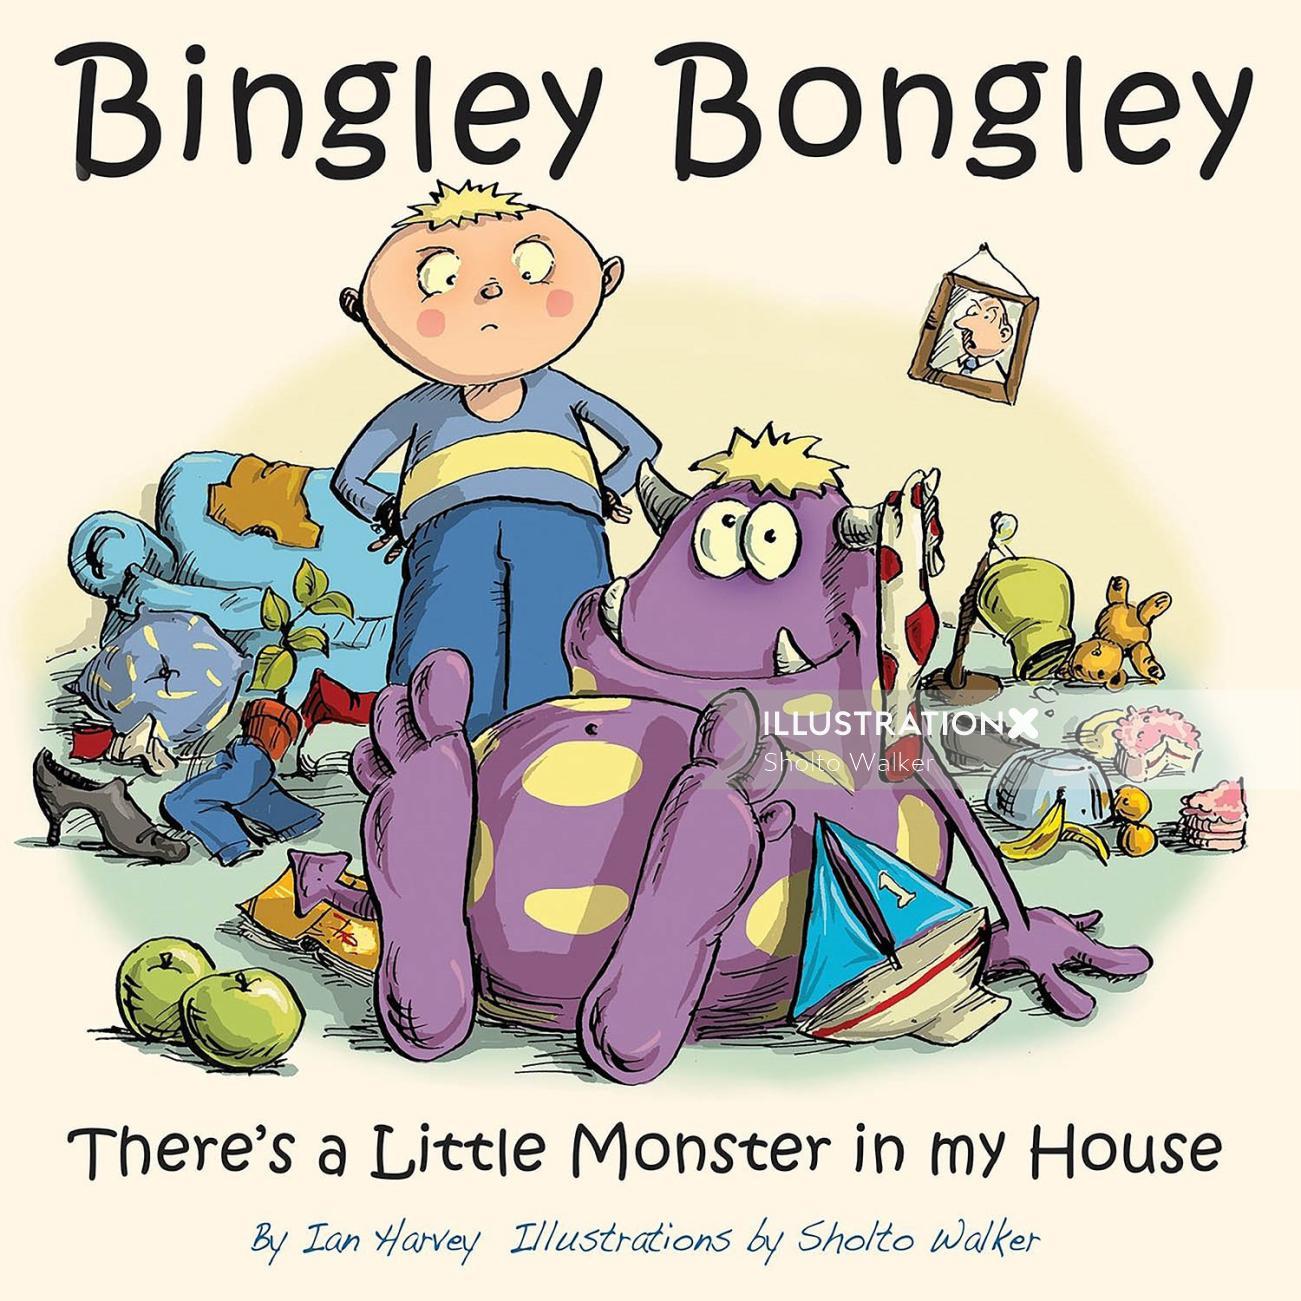 Bingley Bongley Book Cover art